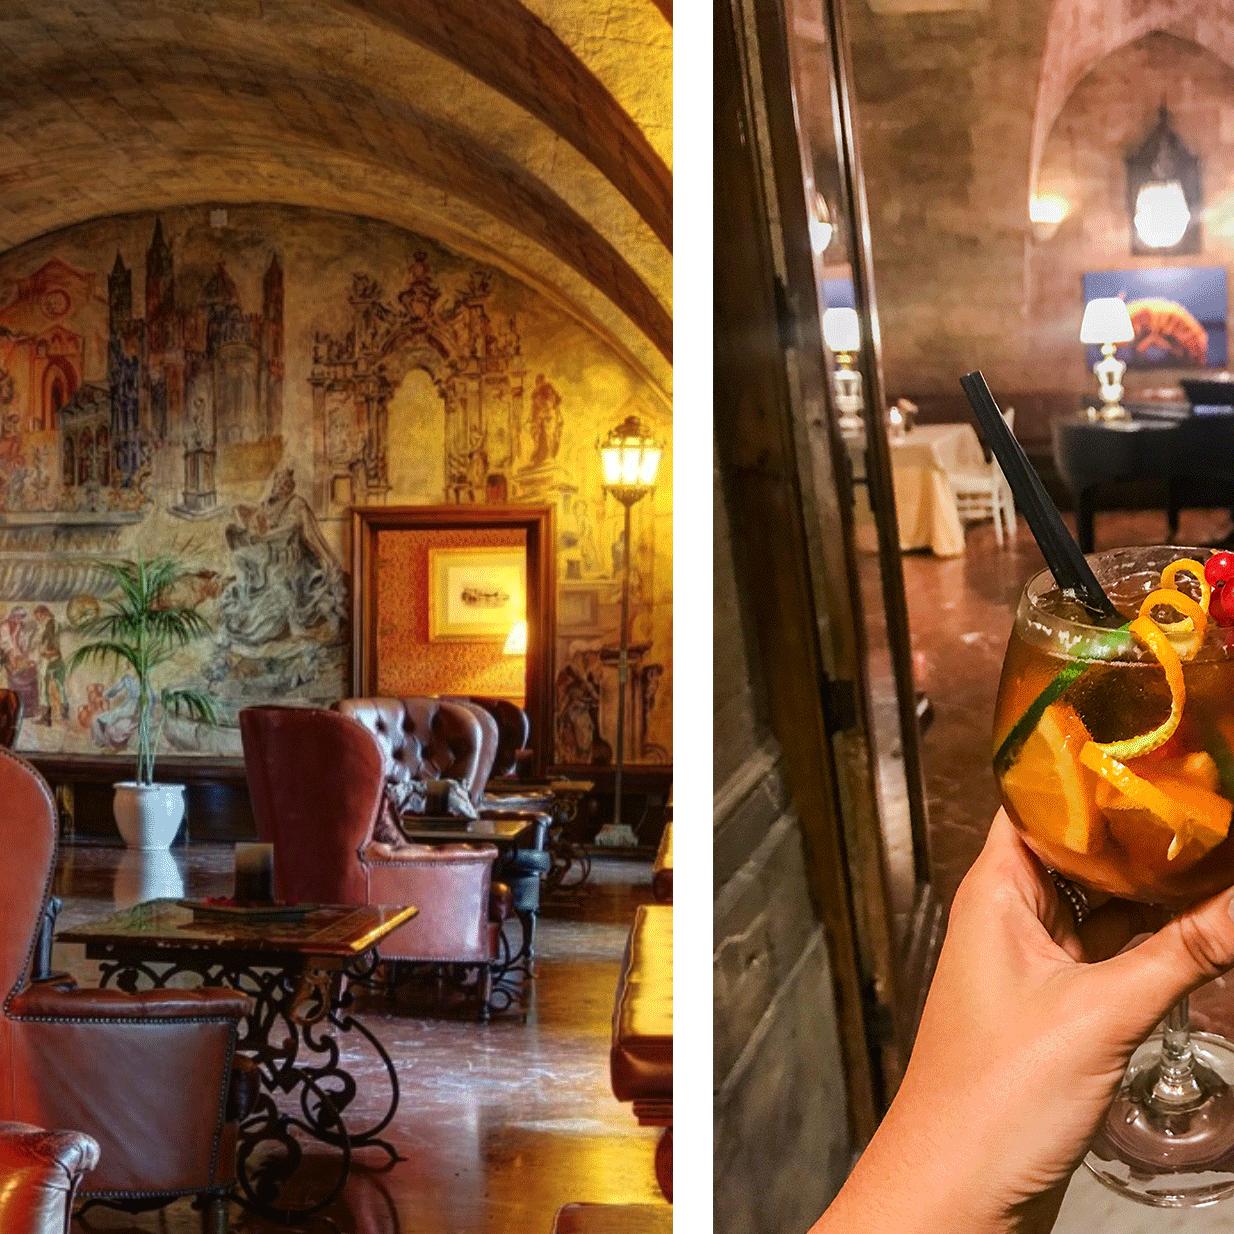 Il lounge bar Des Arcades e il Pimm's: long drink a base di ginger ale